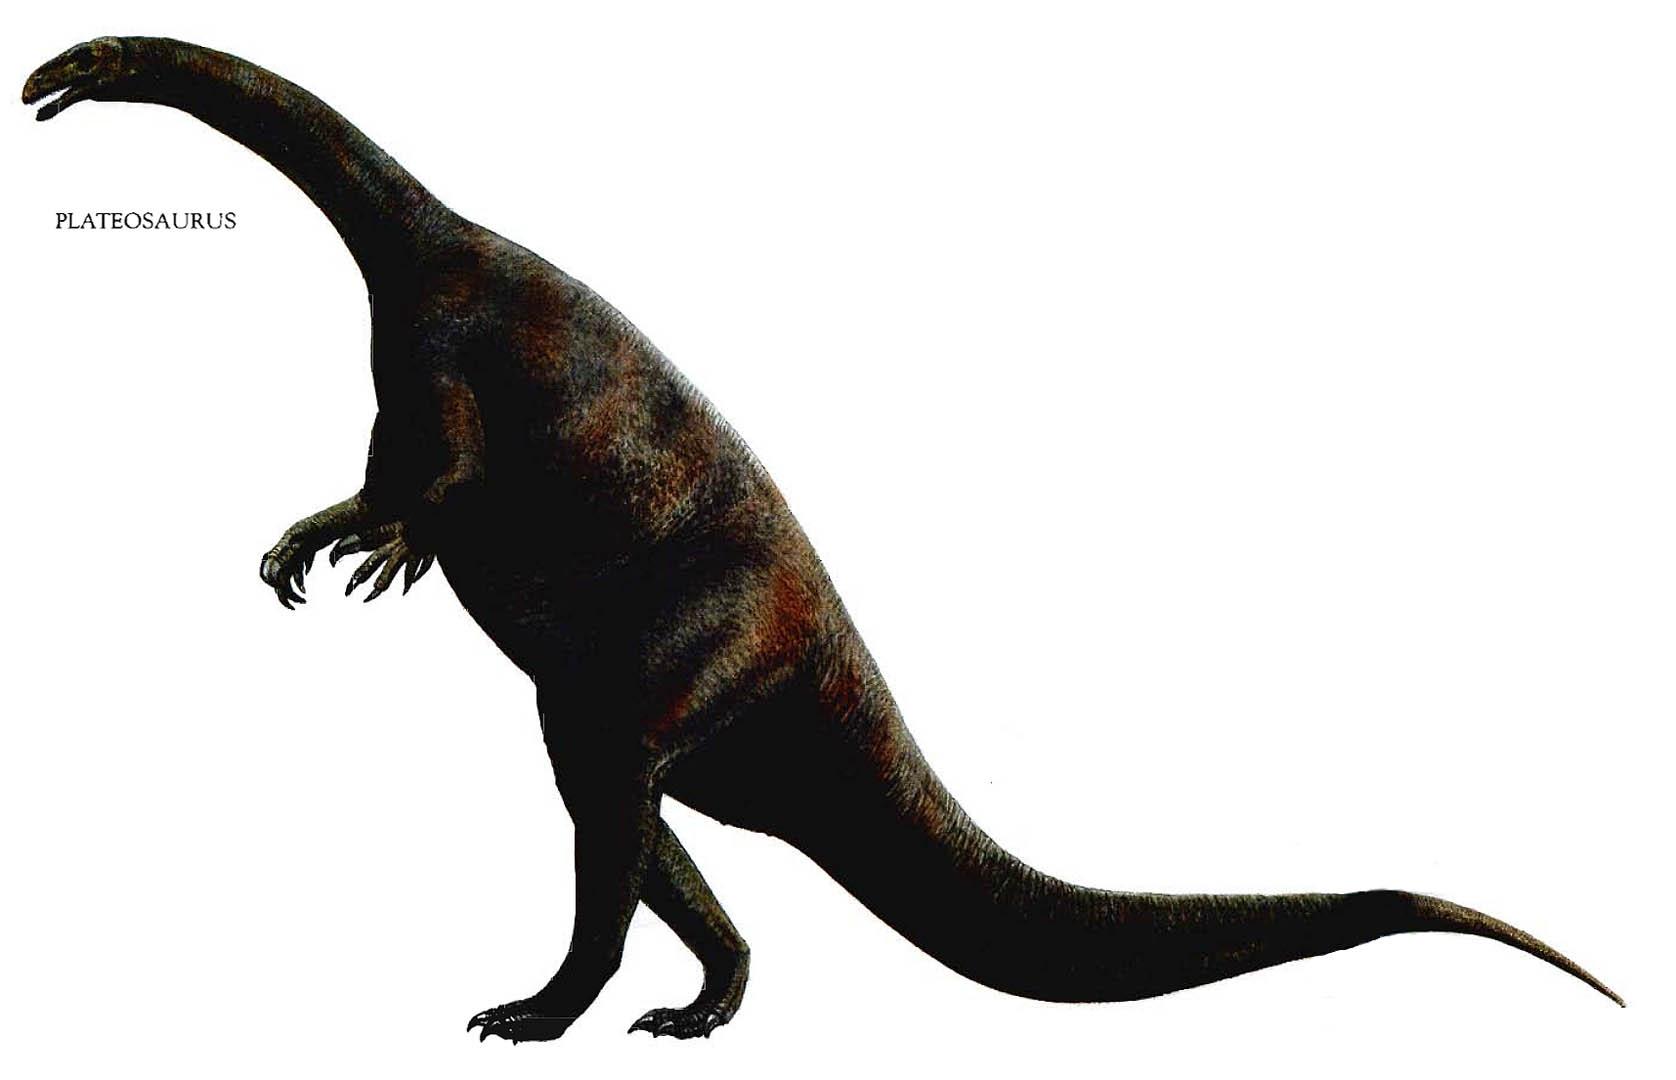 Large plateosaurus herbivore dinosaurs wallpaper image